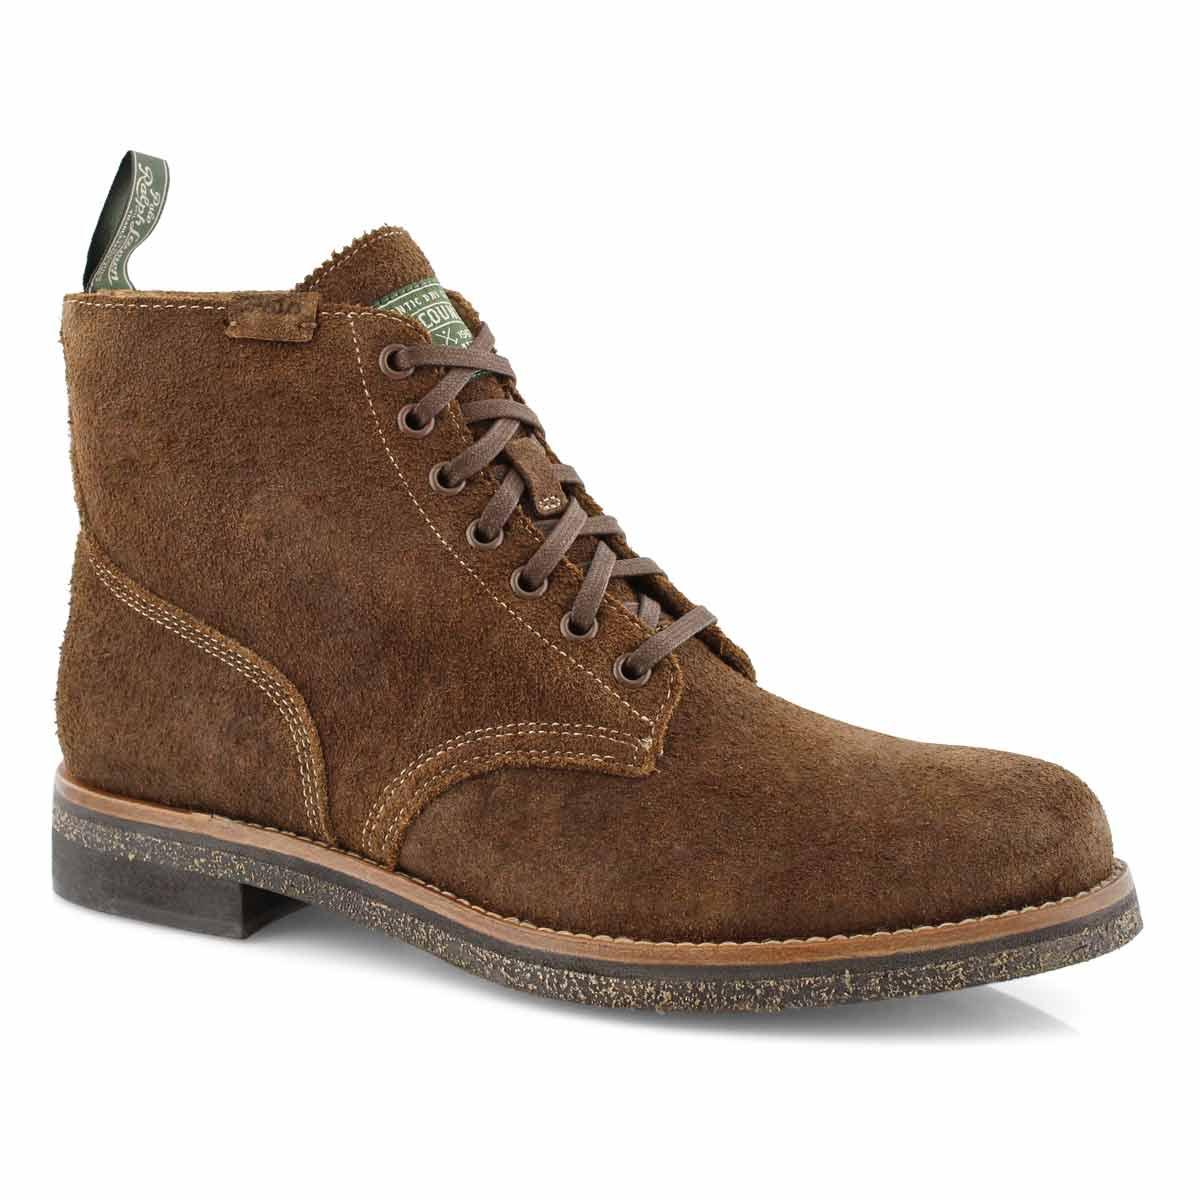 Mns RL Army BT choc brn lace up boots